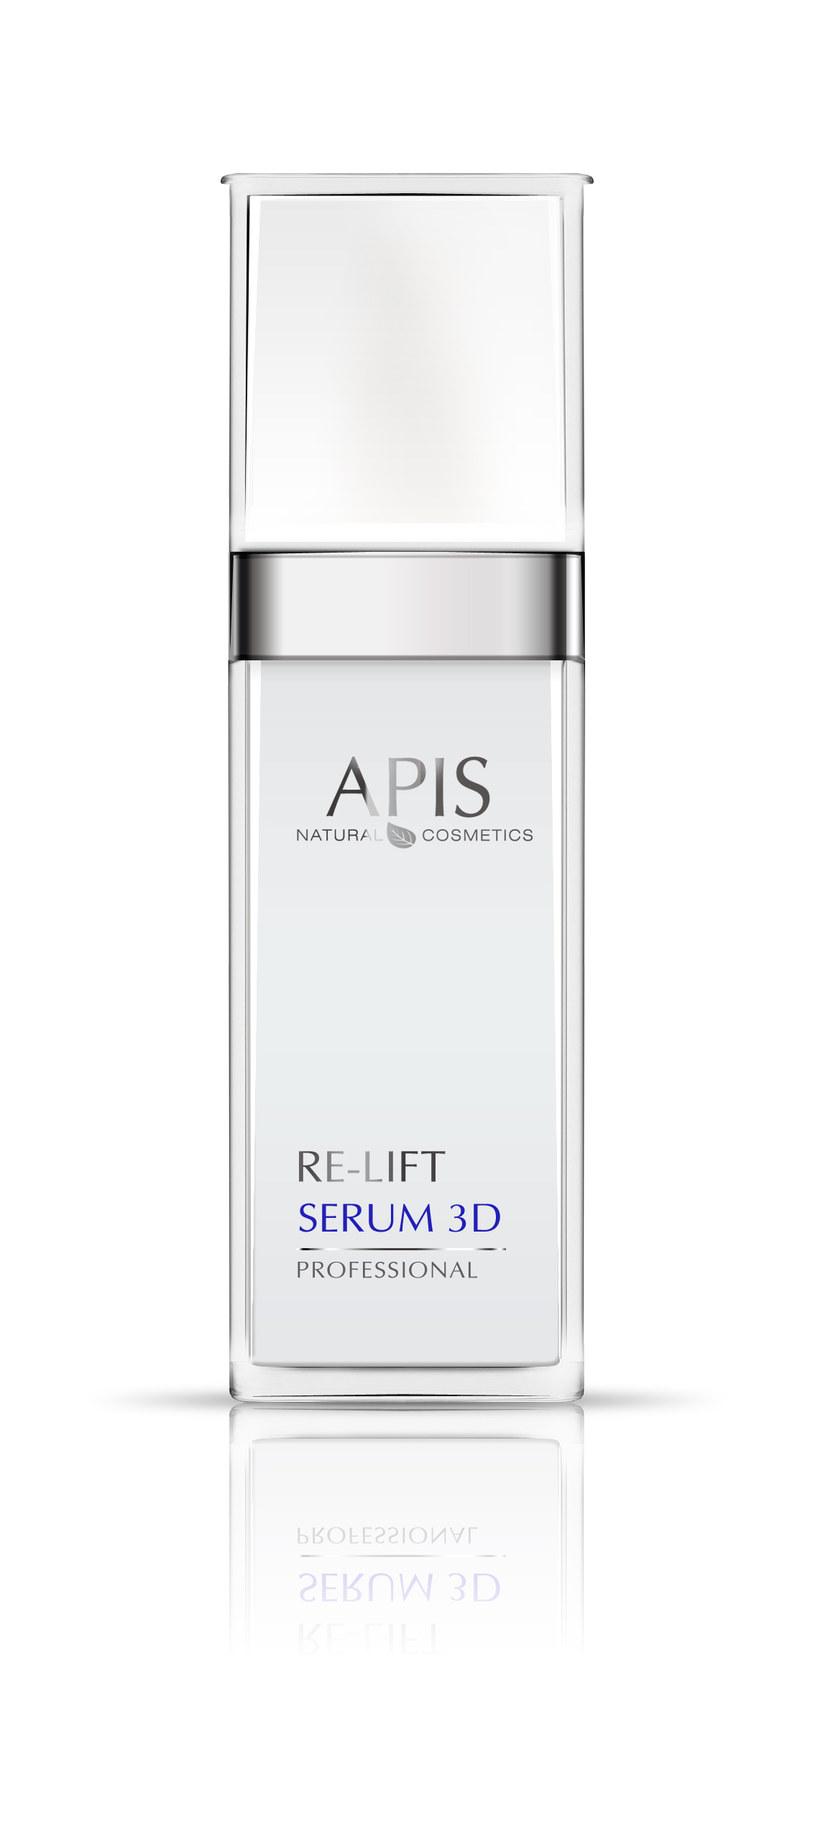 RE-LIFT SERUM 3D /materiały prasowe